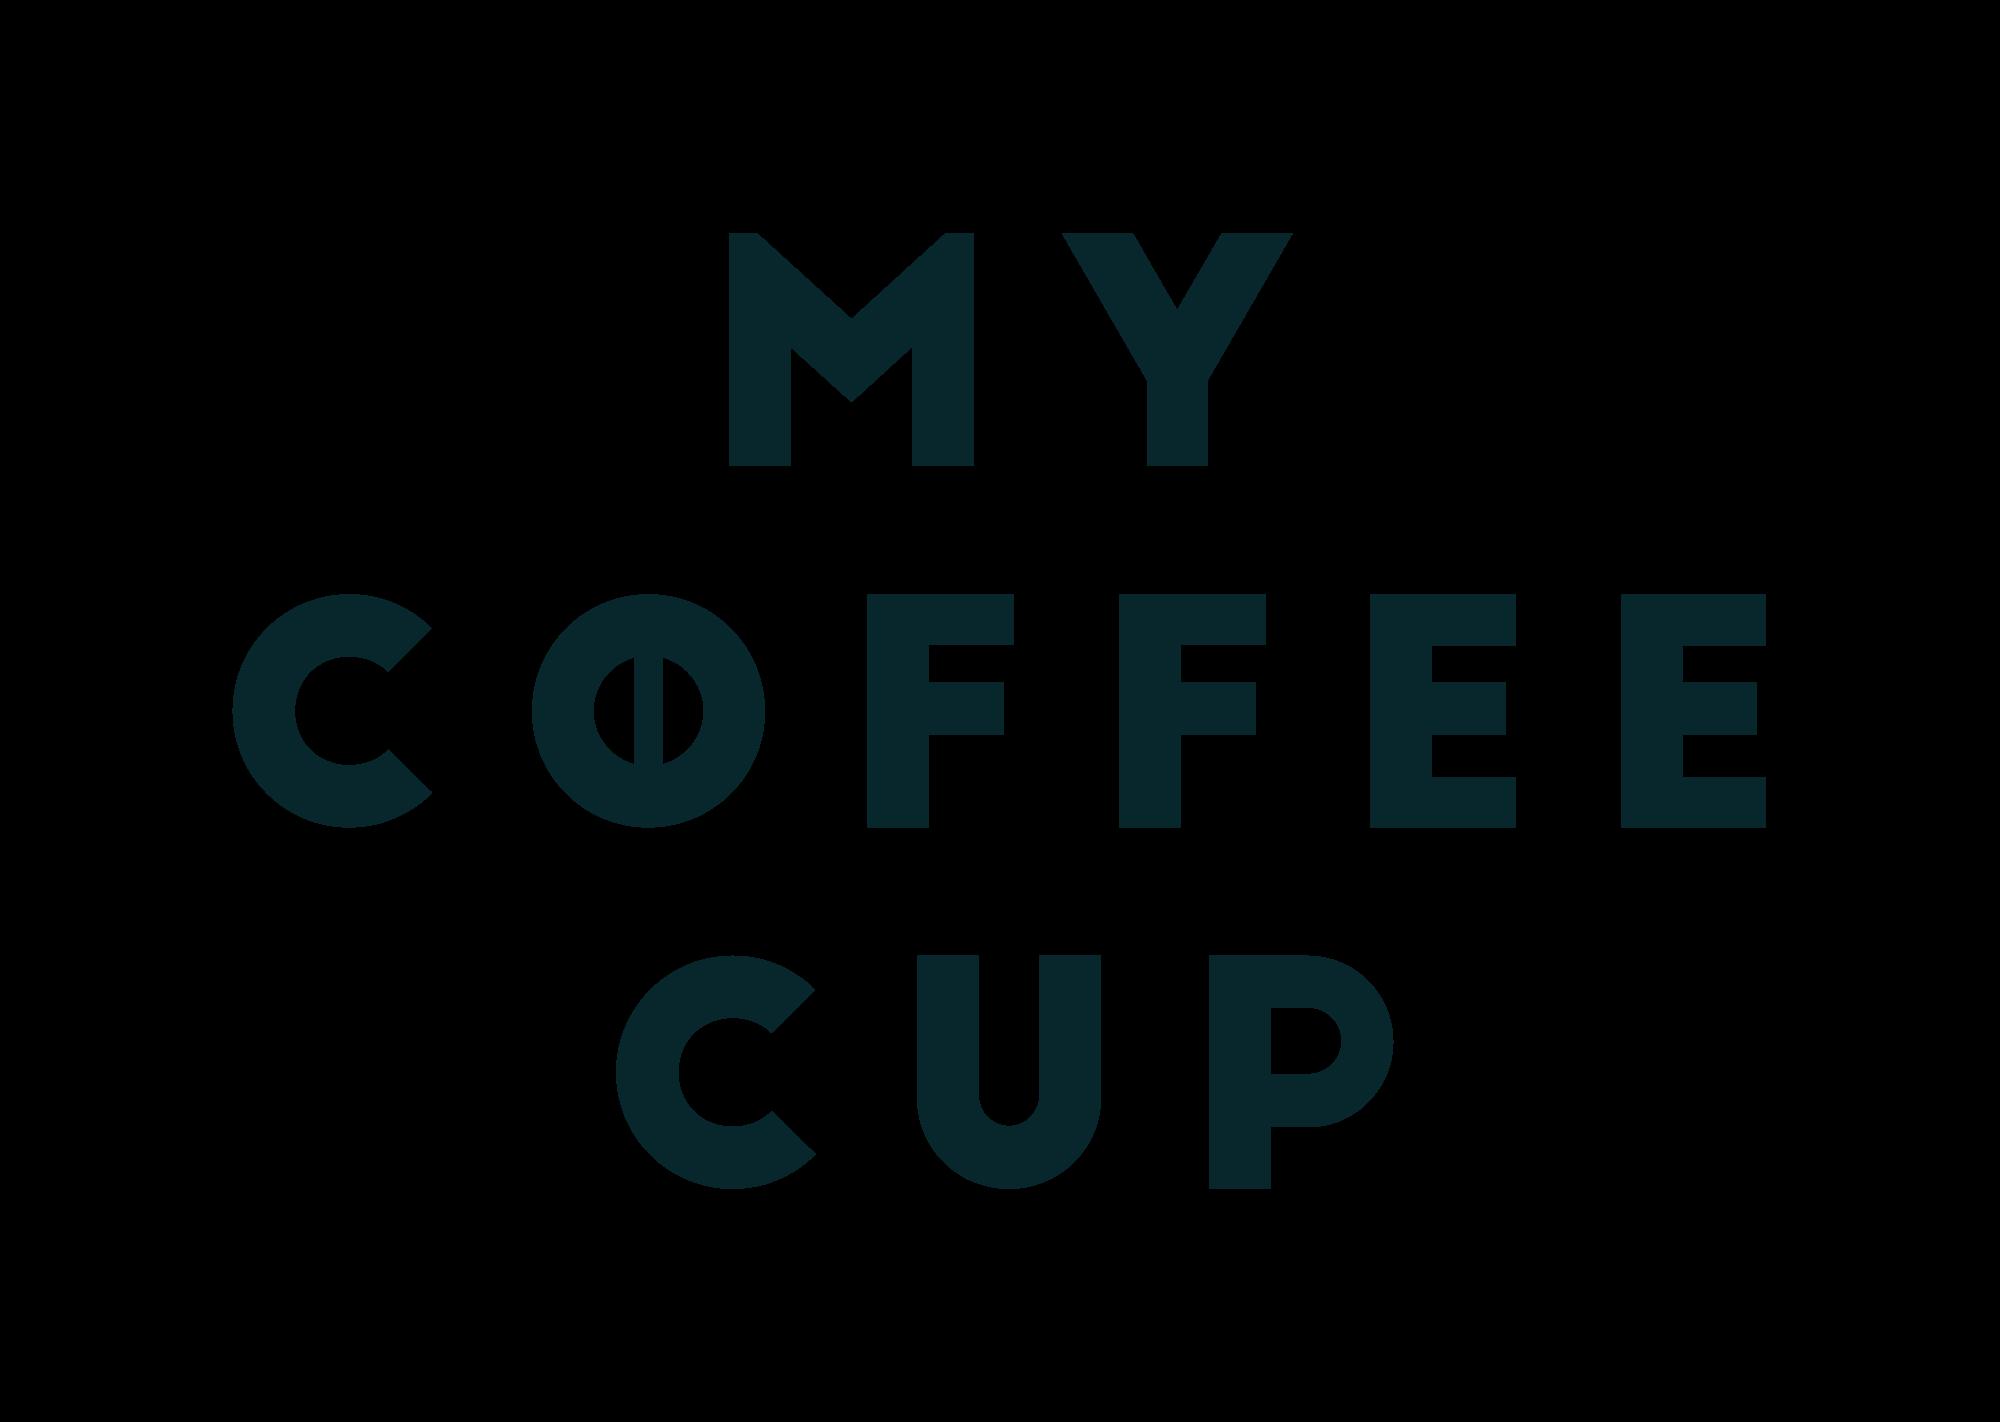 My Coffee Cup Logo